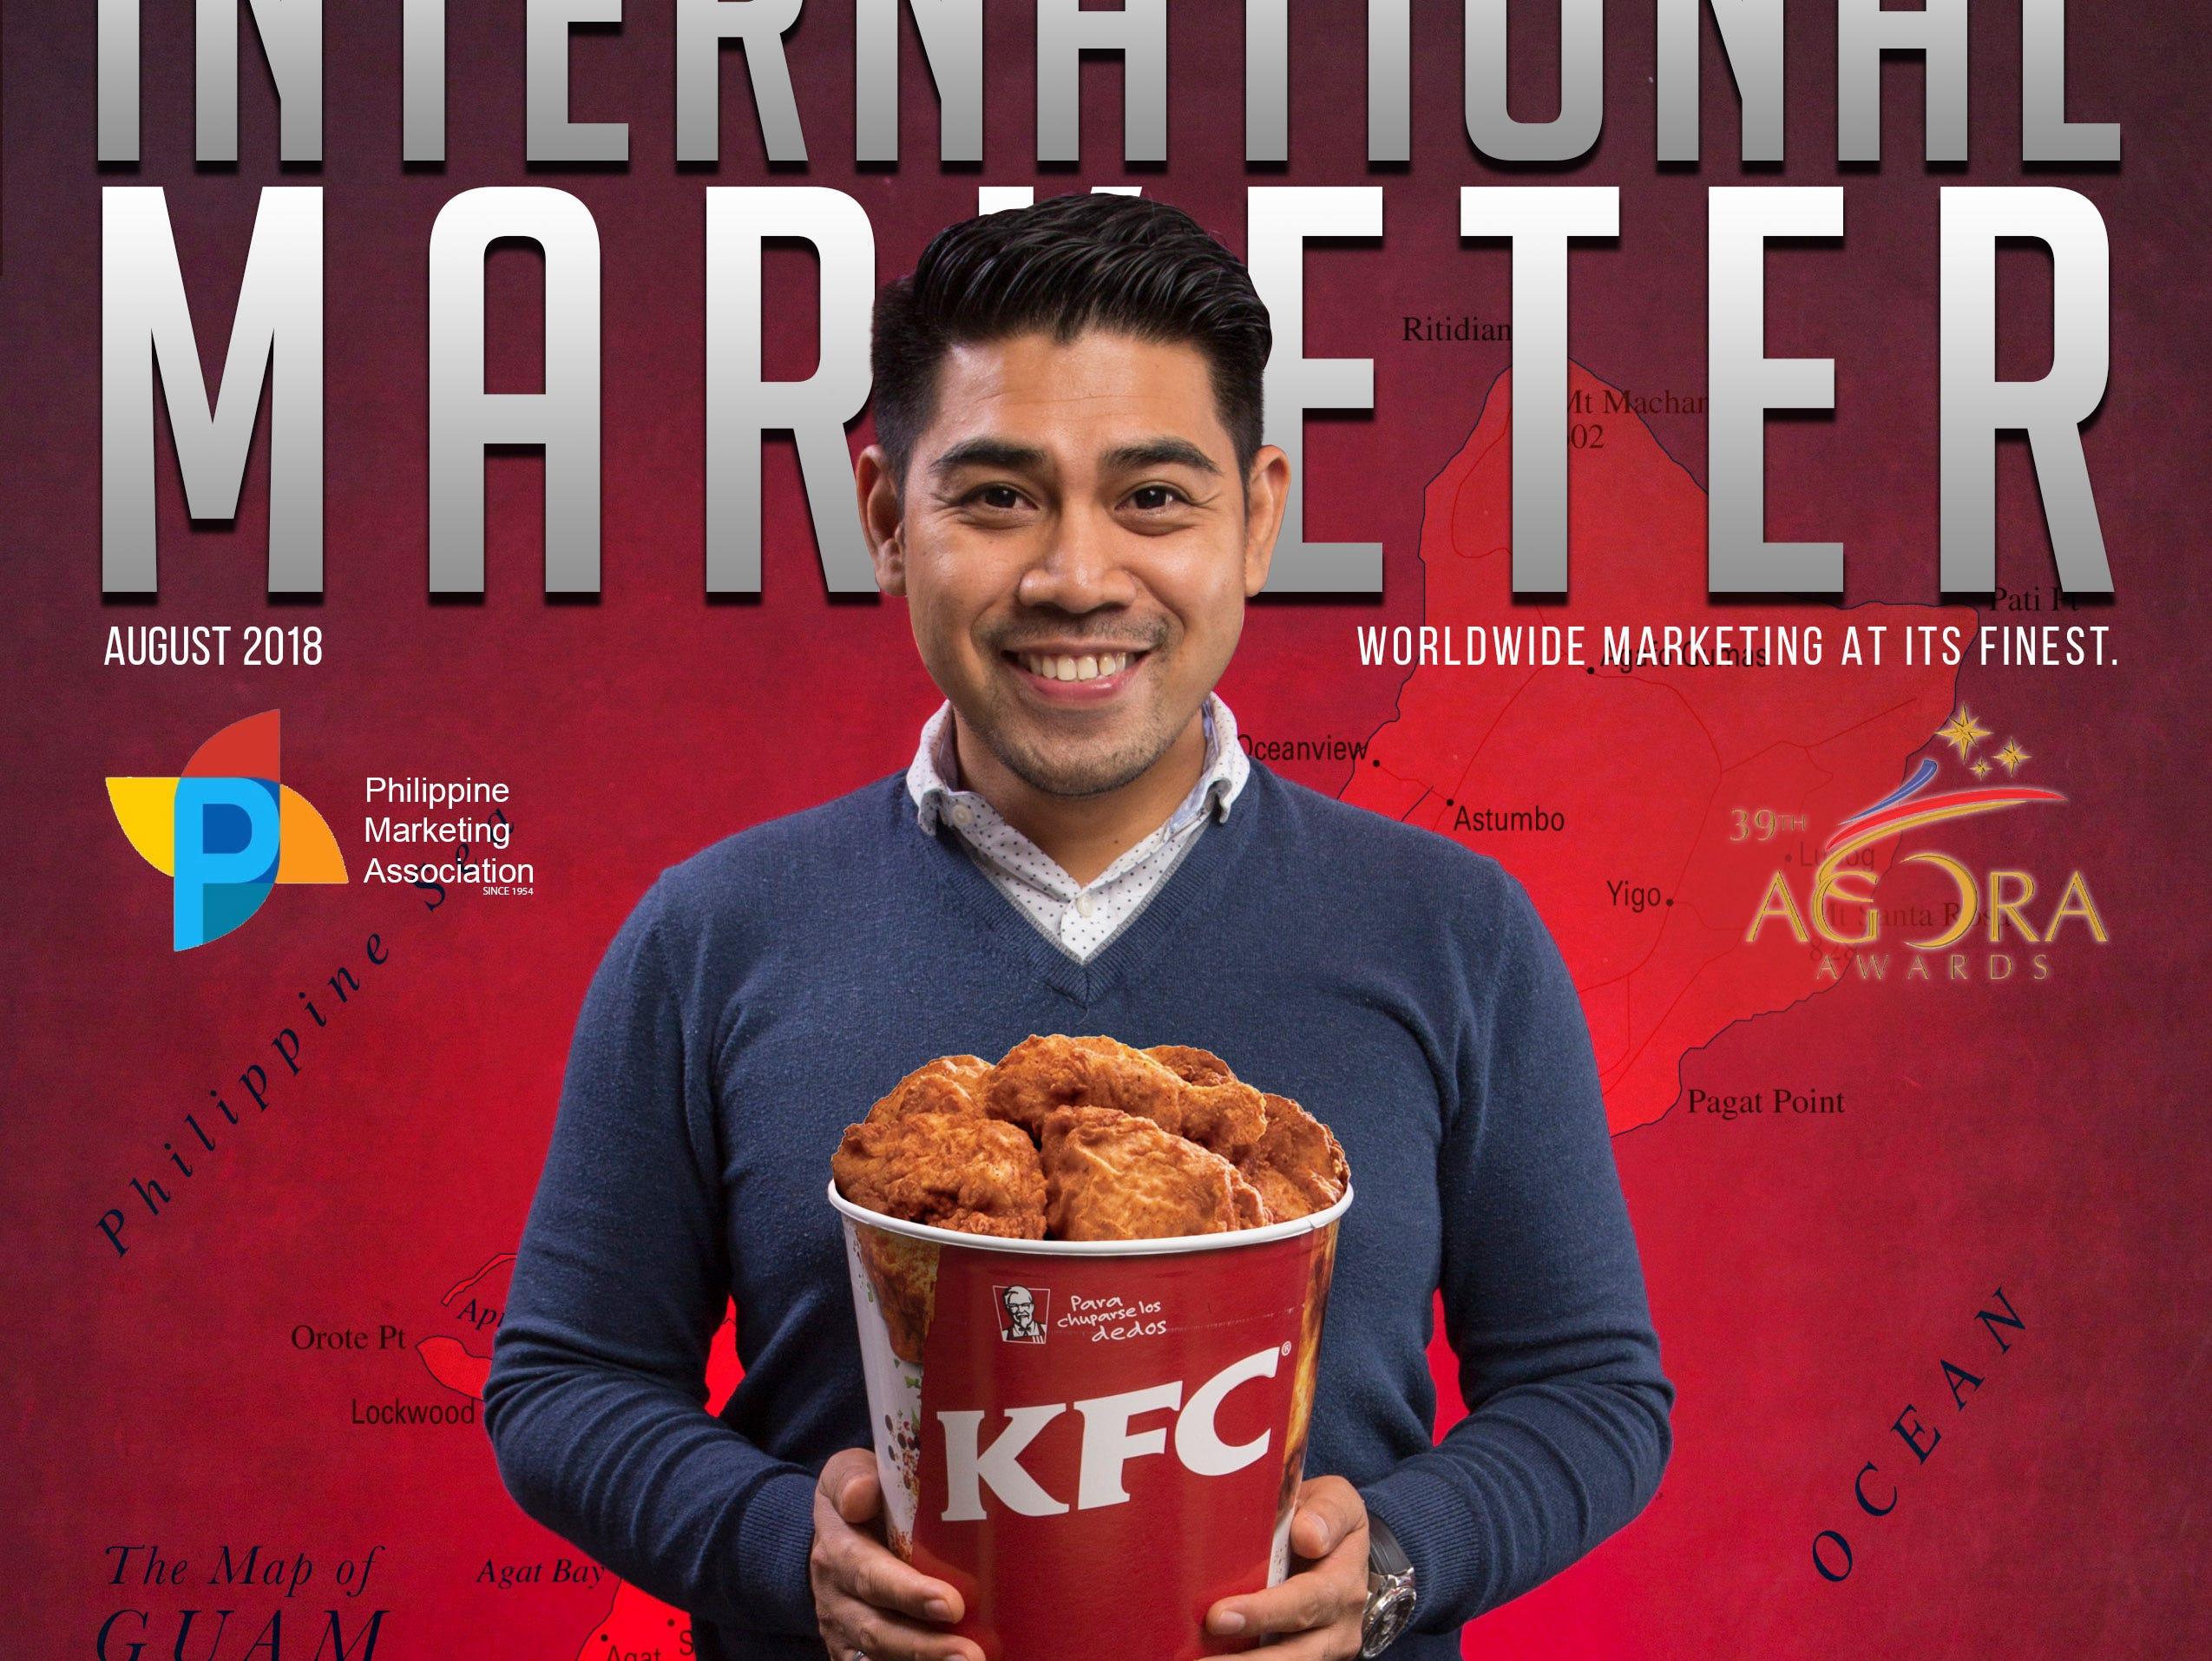 KFC marketing executive wins prestigious award